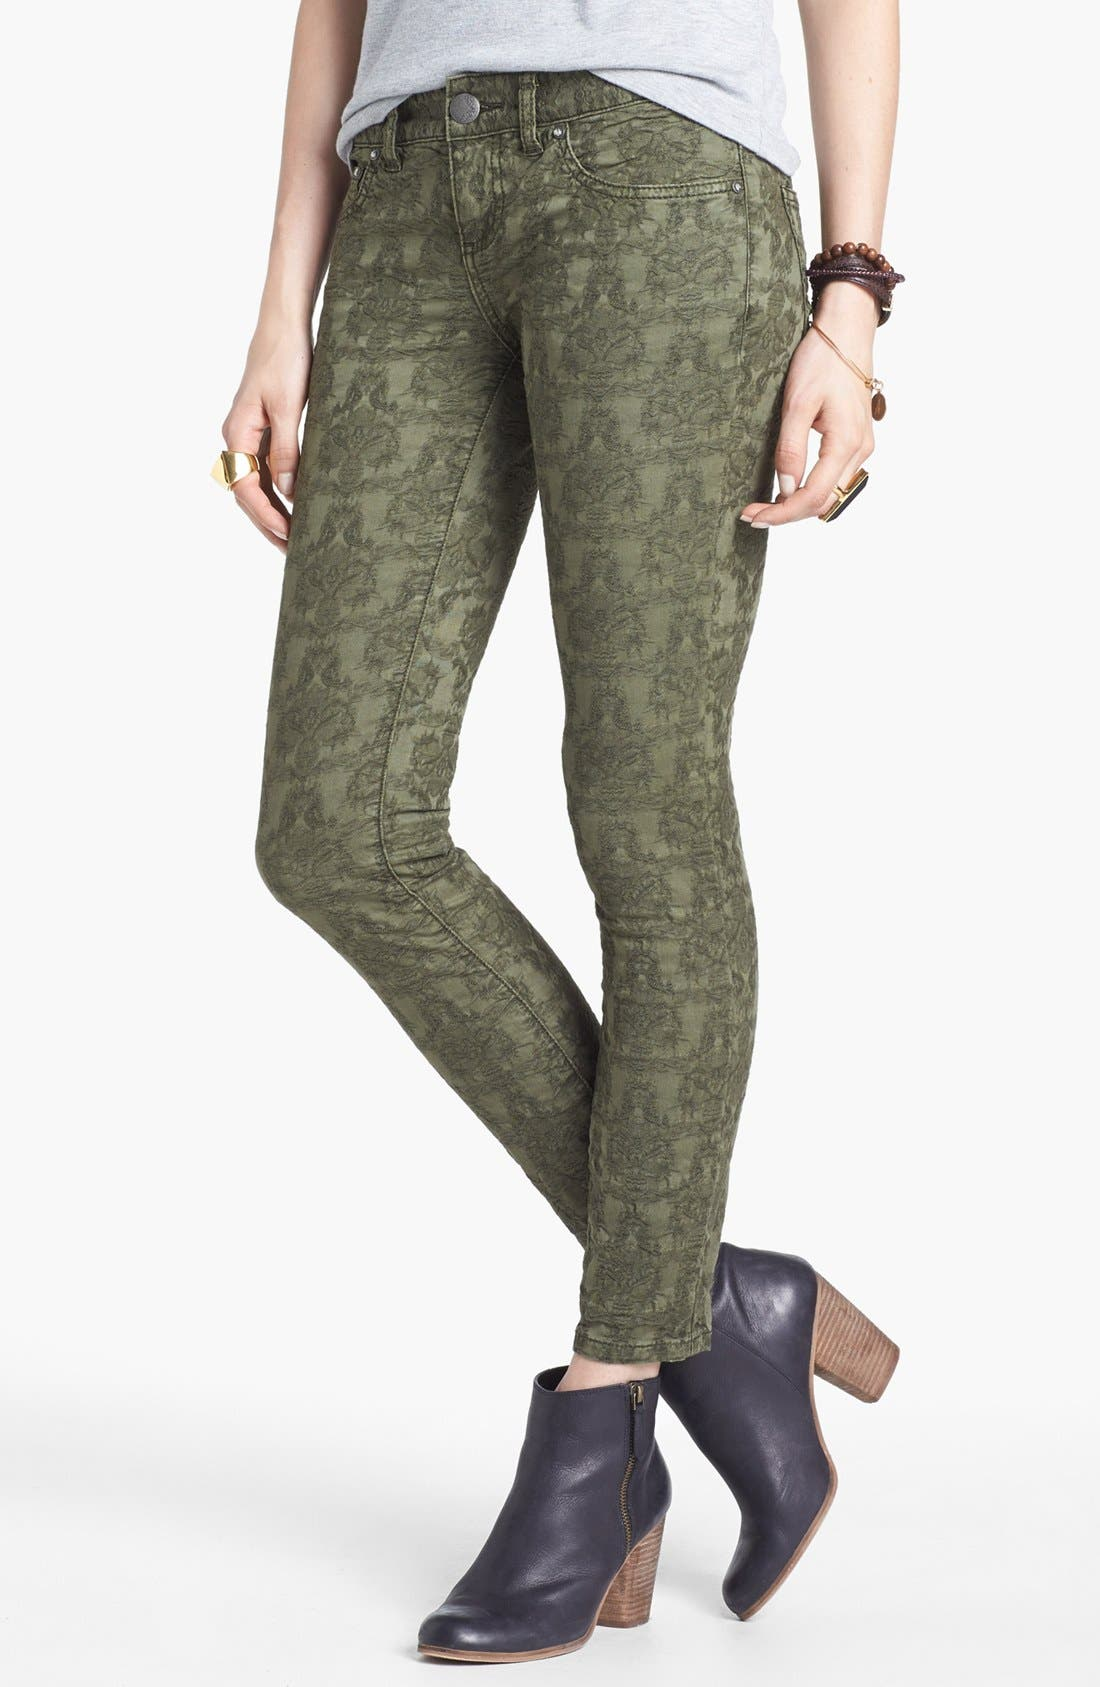 Main Image - Free People Jacquard Skinny Jeans (Olive)